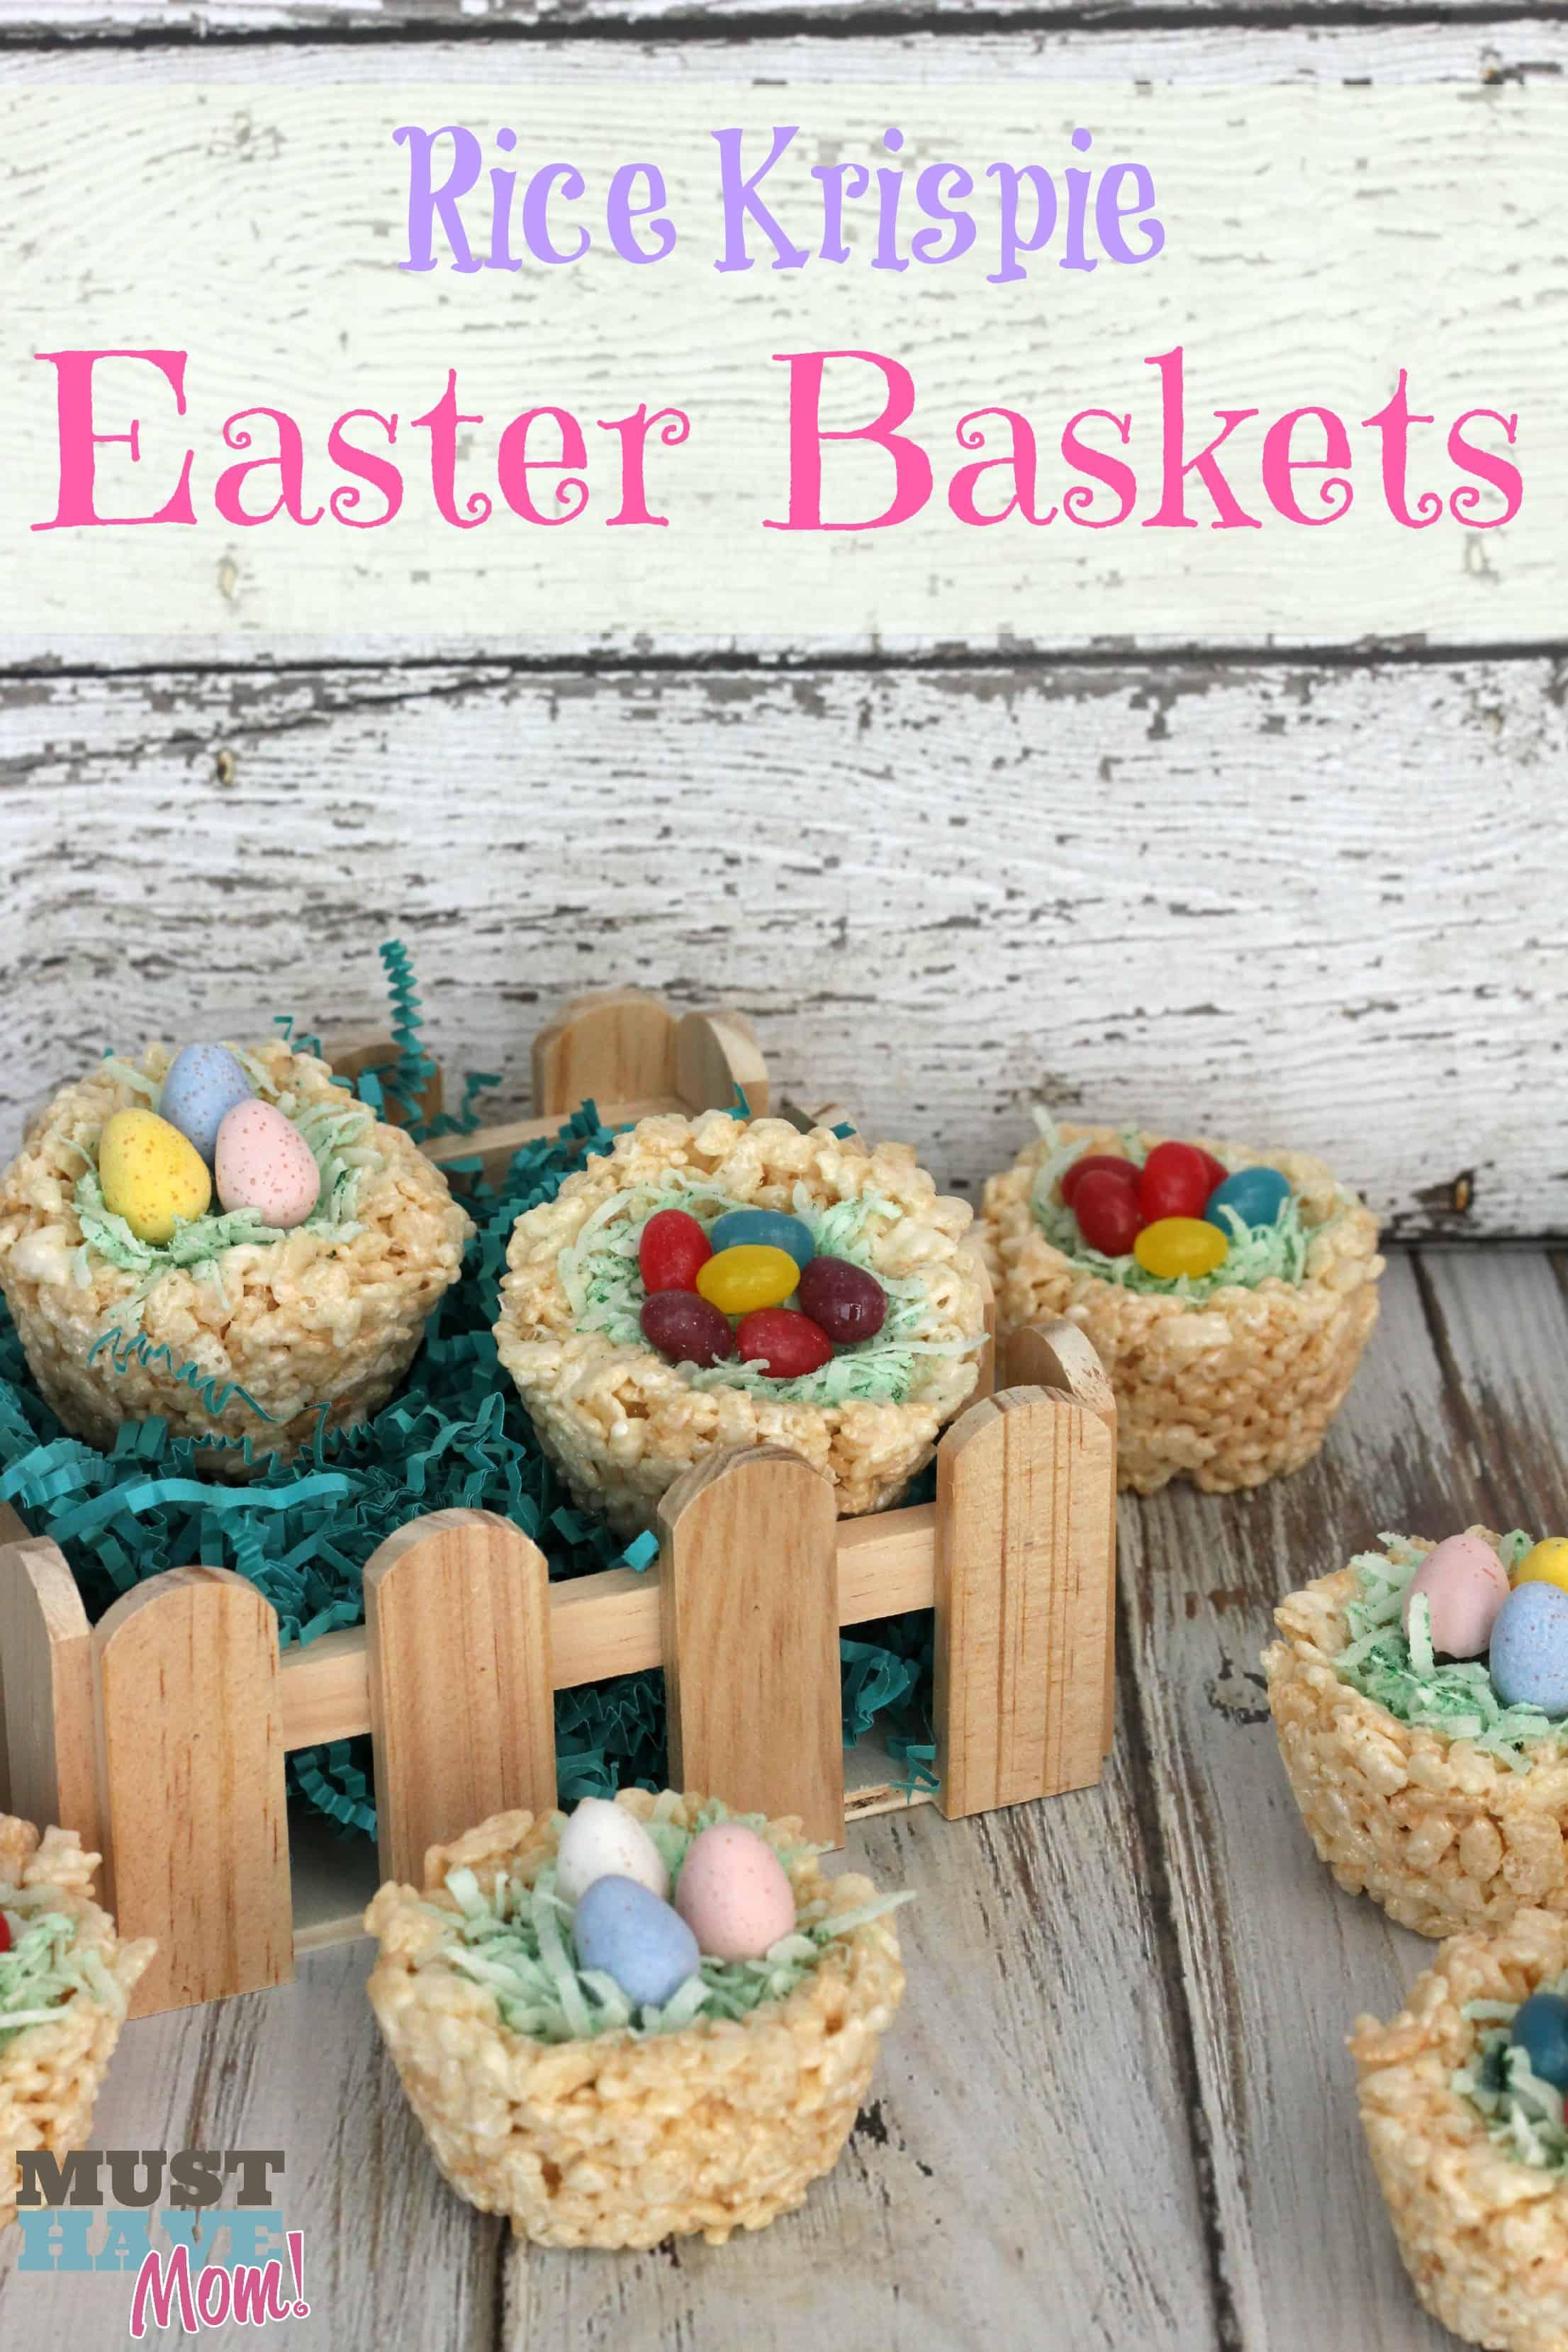 Rice Krispies Easter Baskets Recipe